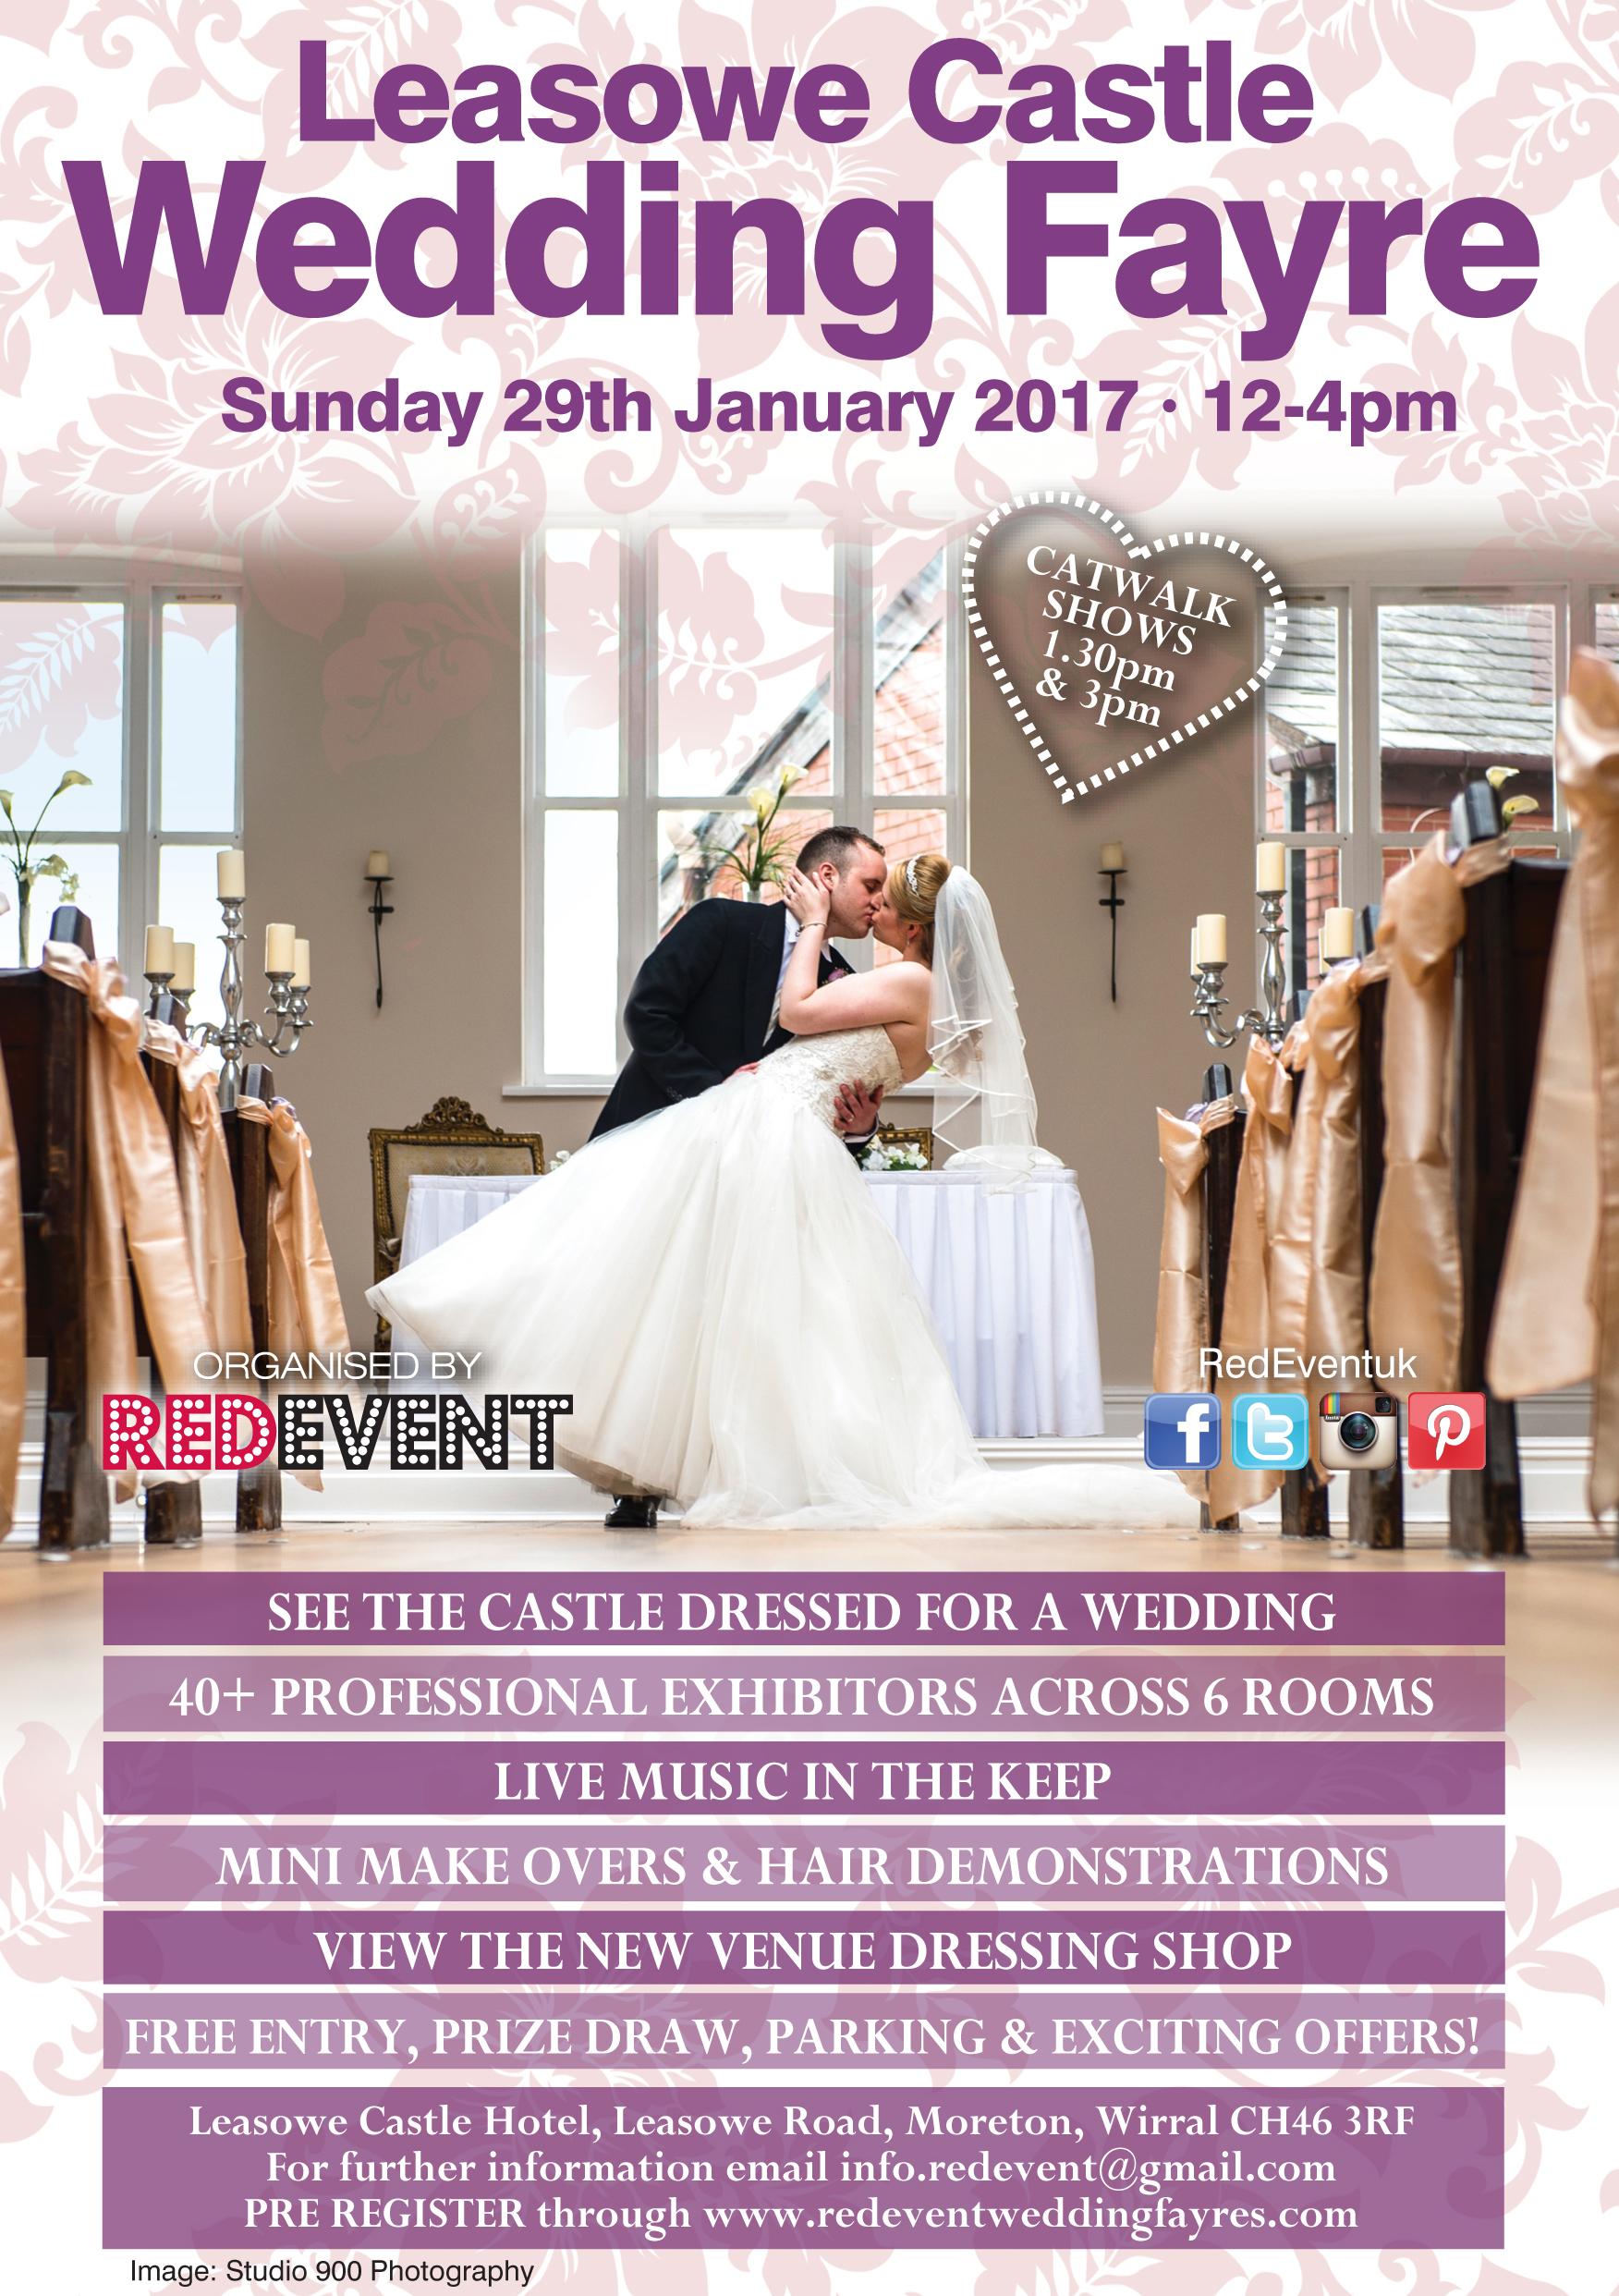 Leasowe Castle Hotel Wirral Wedding Fayre Flyer